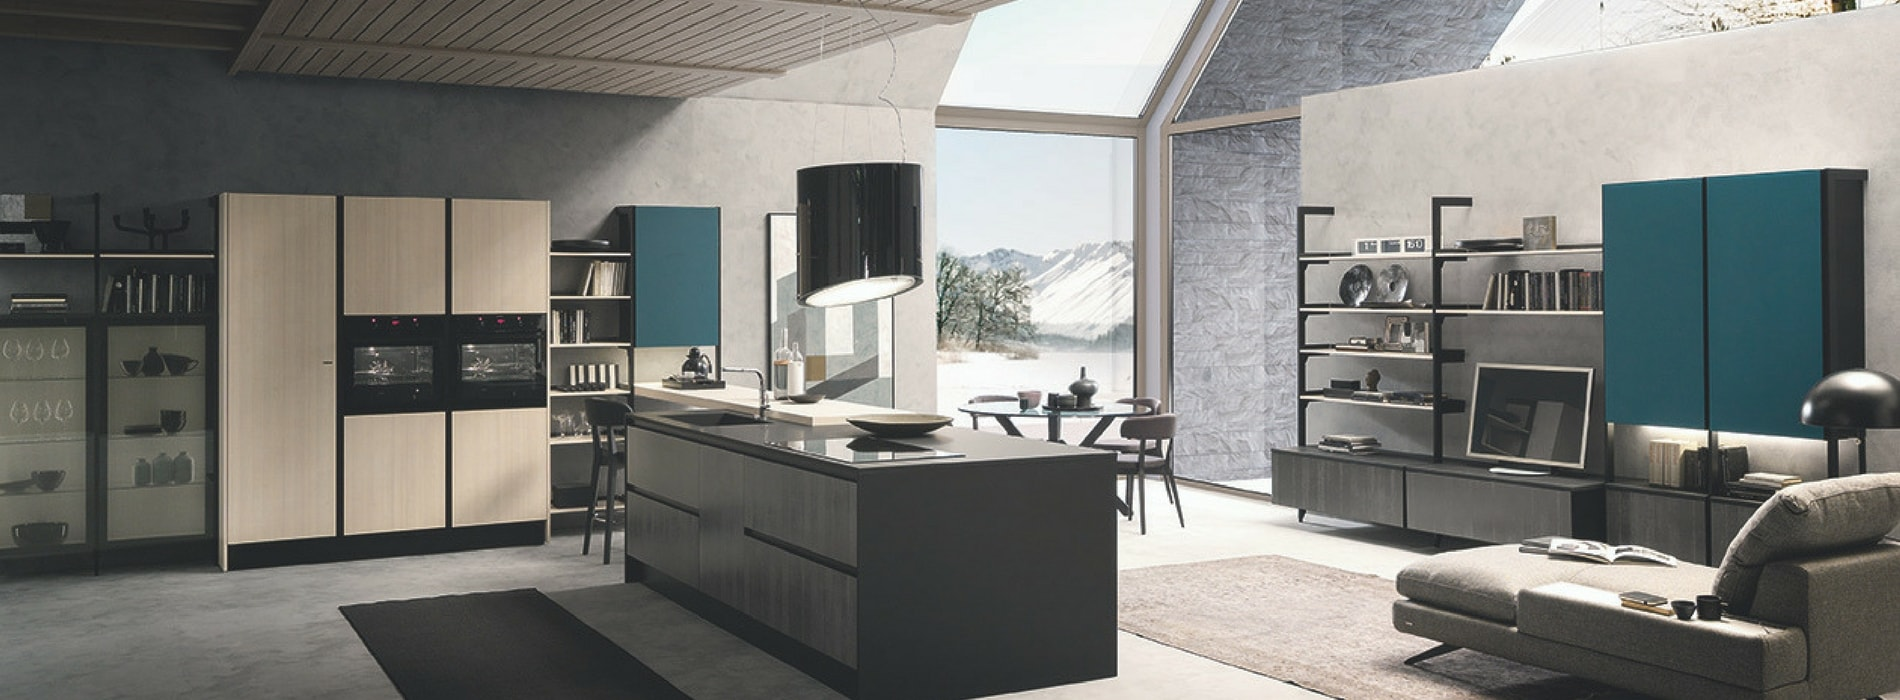 Cucine con isola - Cucine open space con isola ...